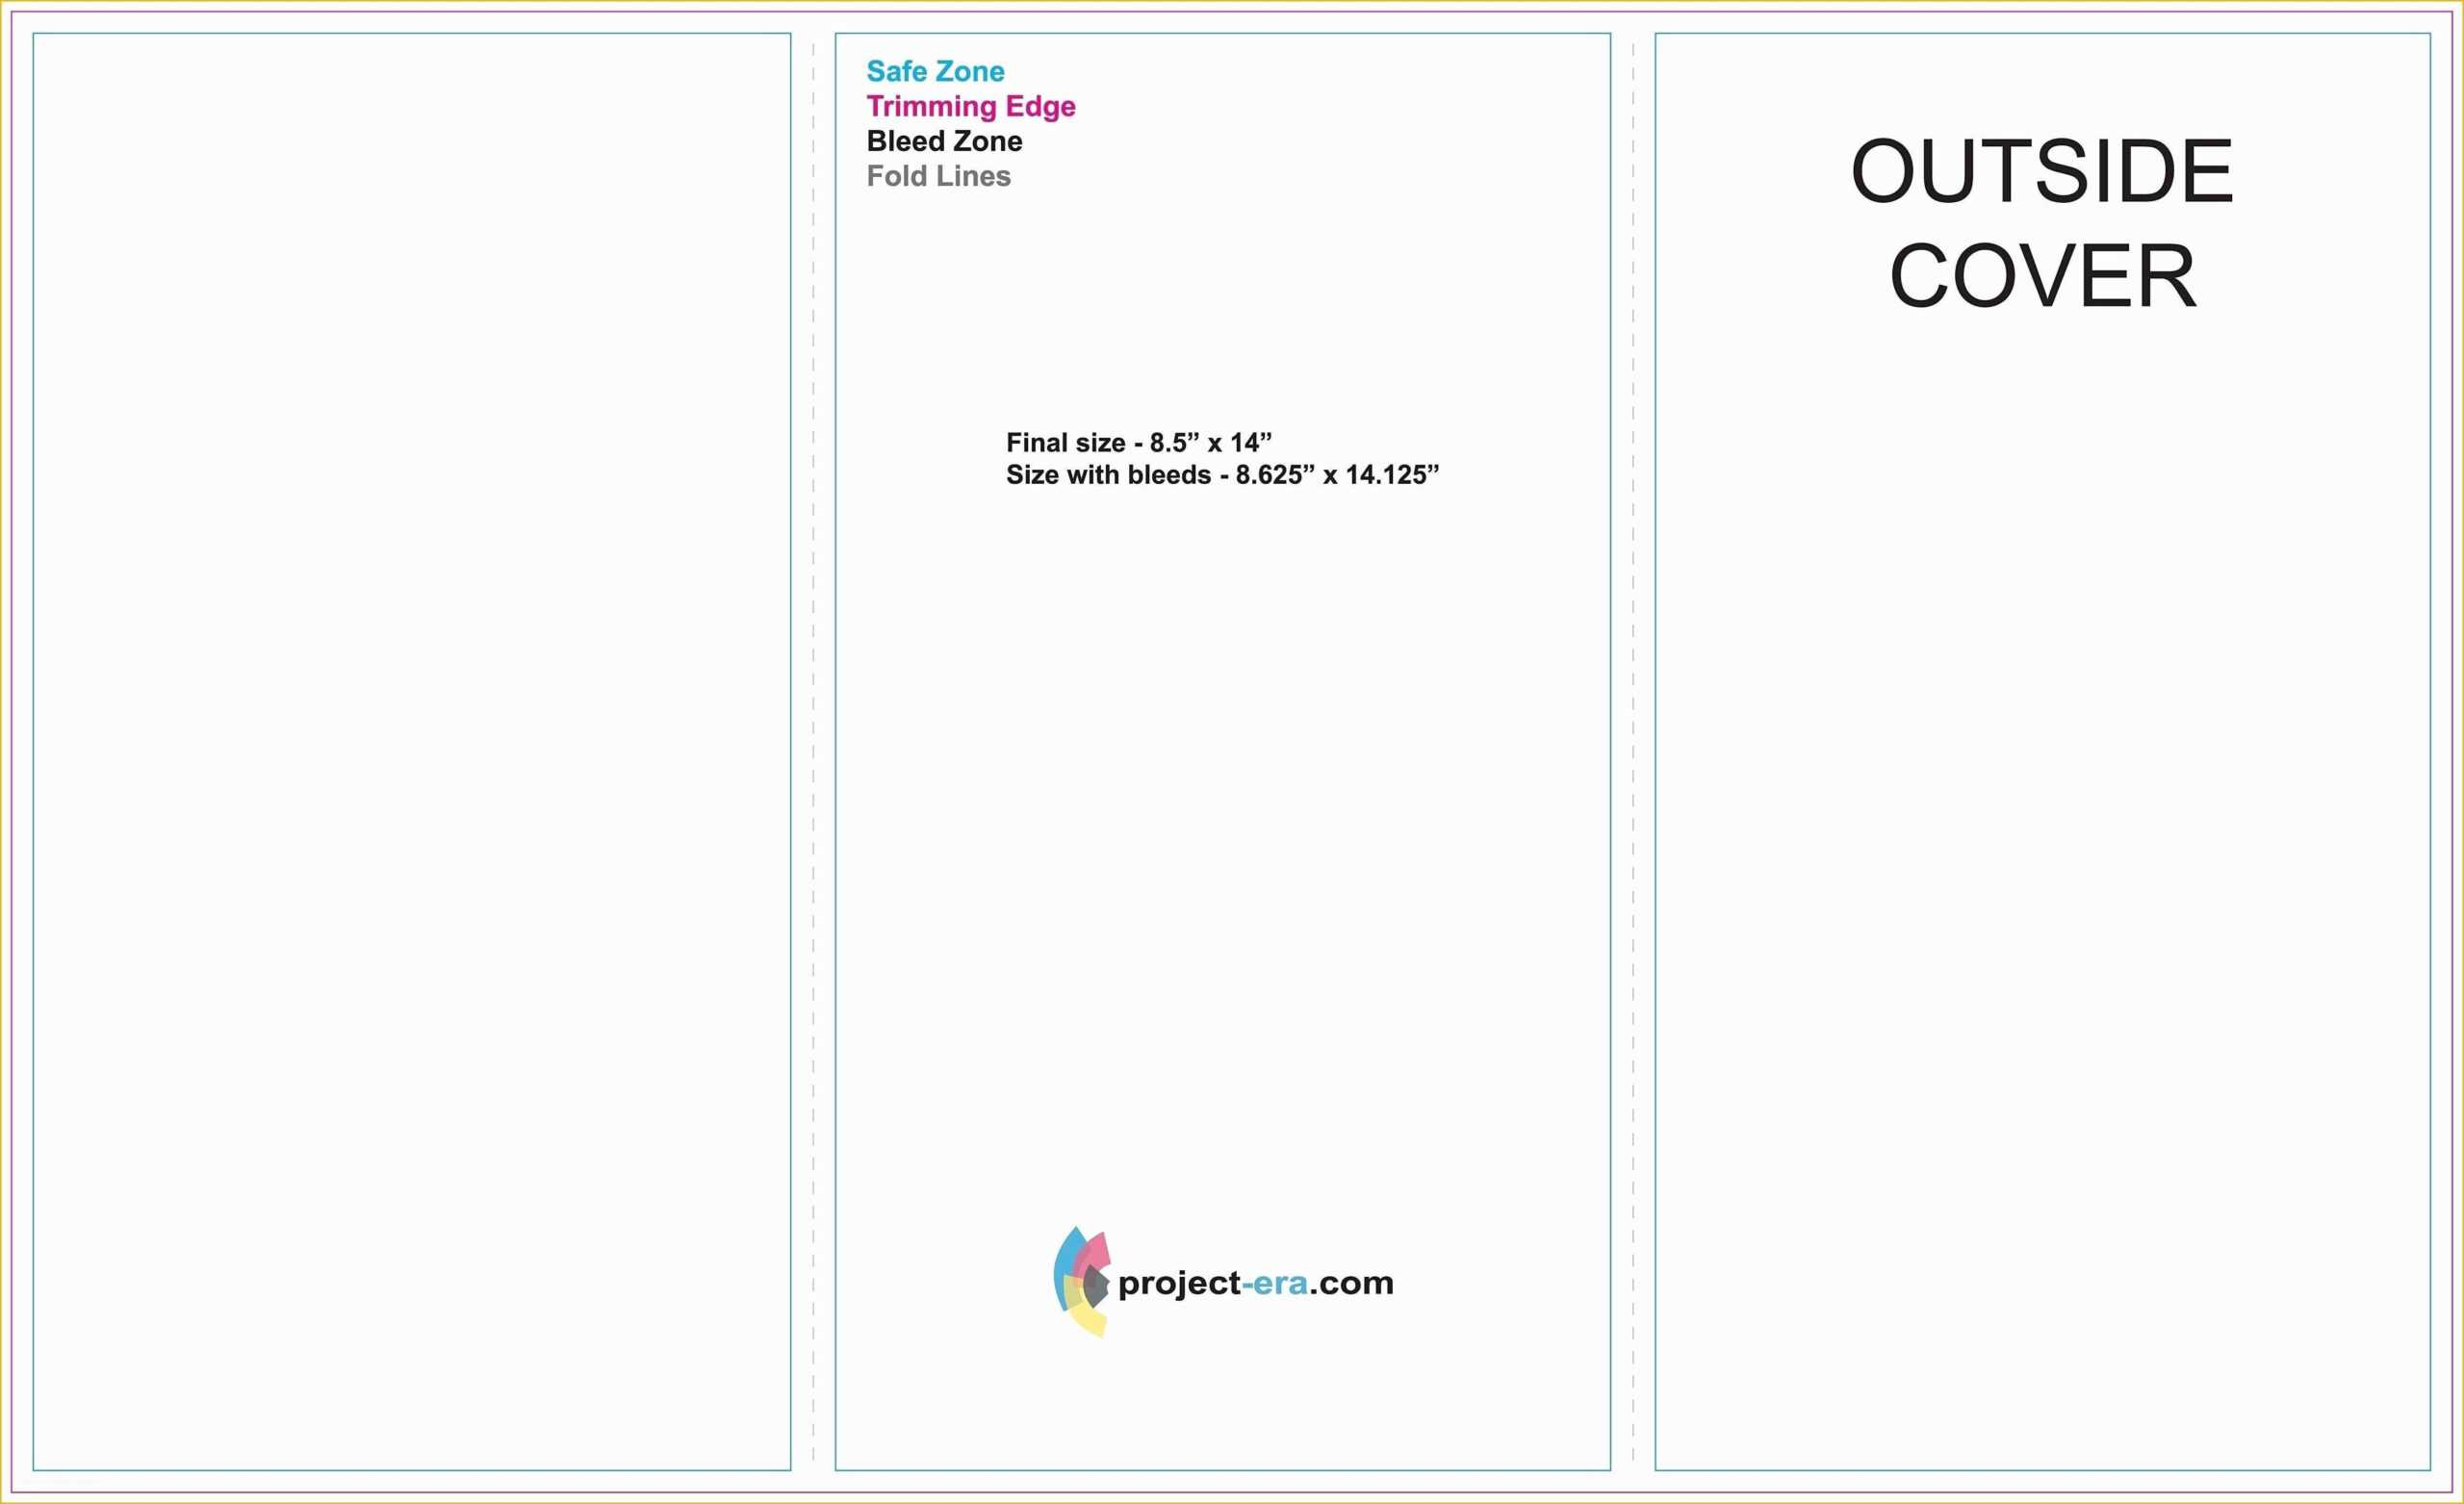 024 Brochure Google Docs Template Ideas Free Tri Fold Of regarding Google Docs Templates Brochure